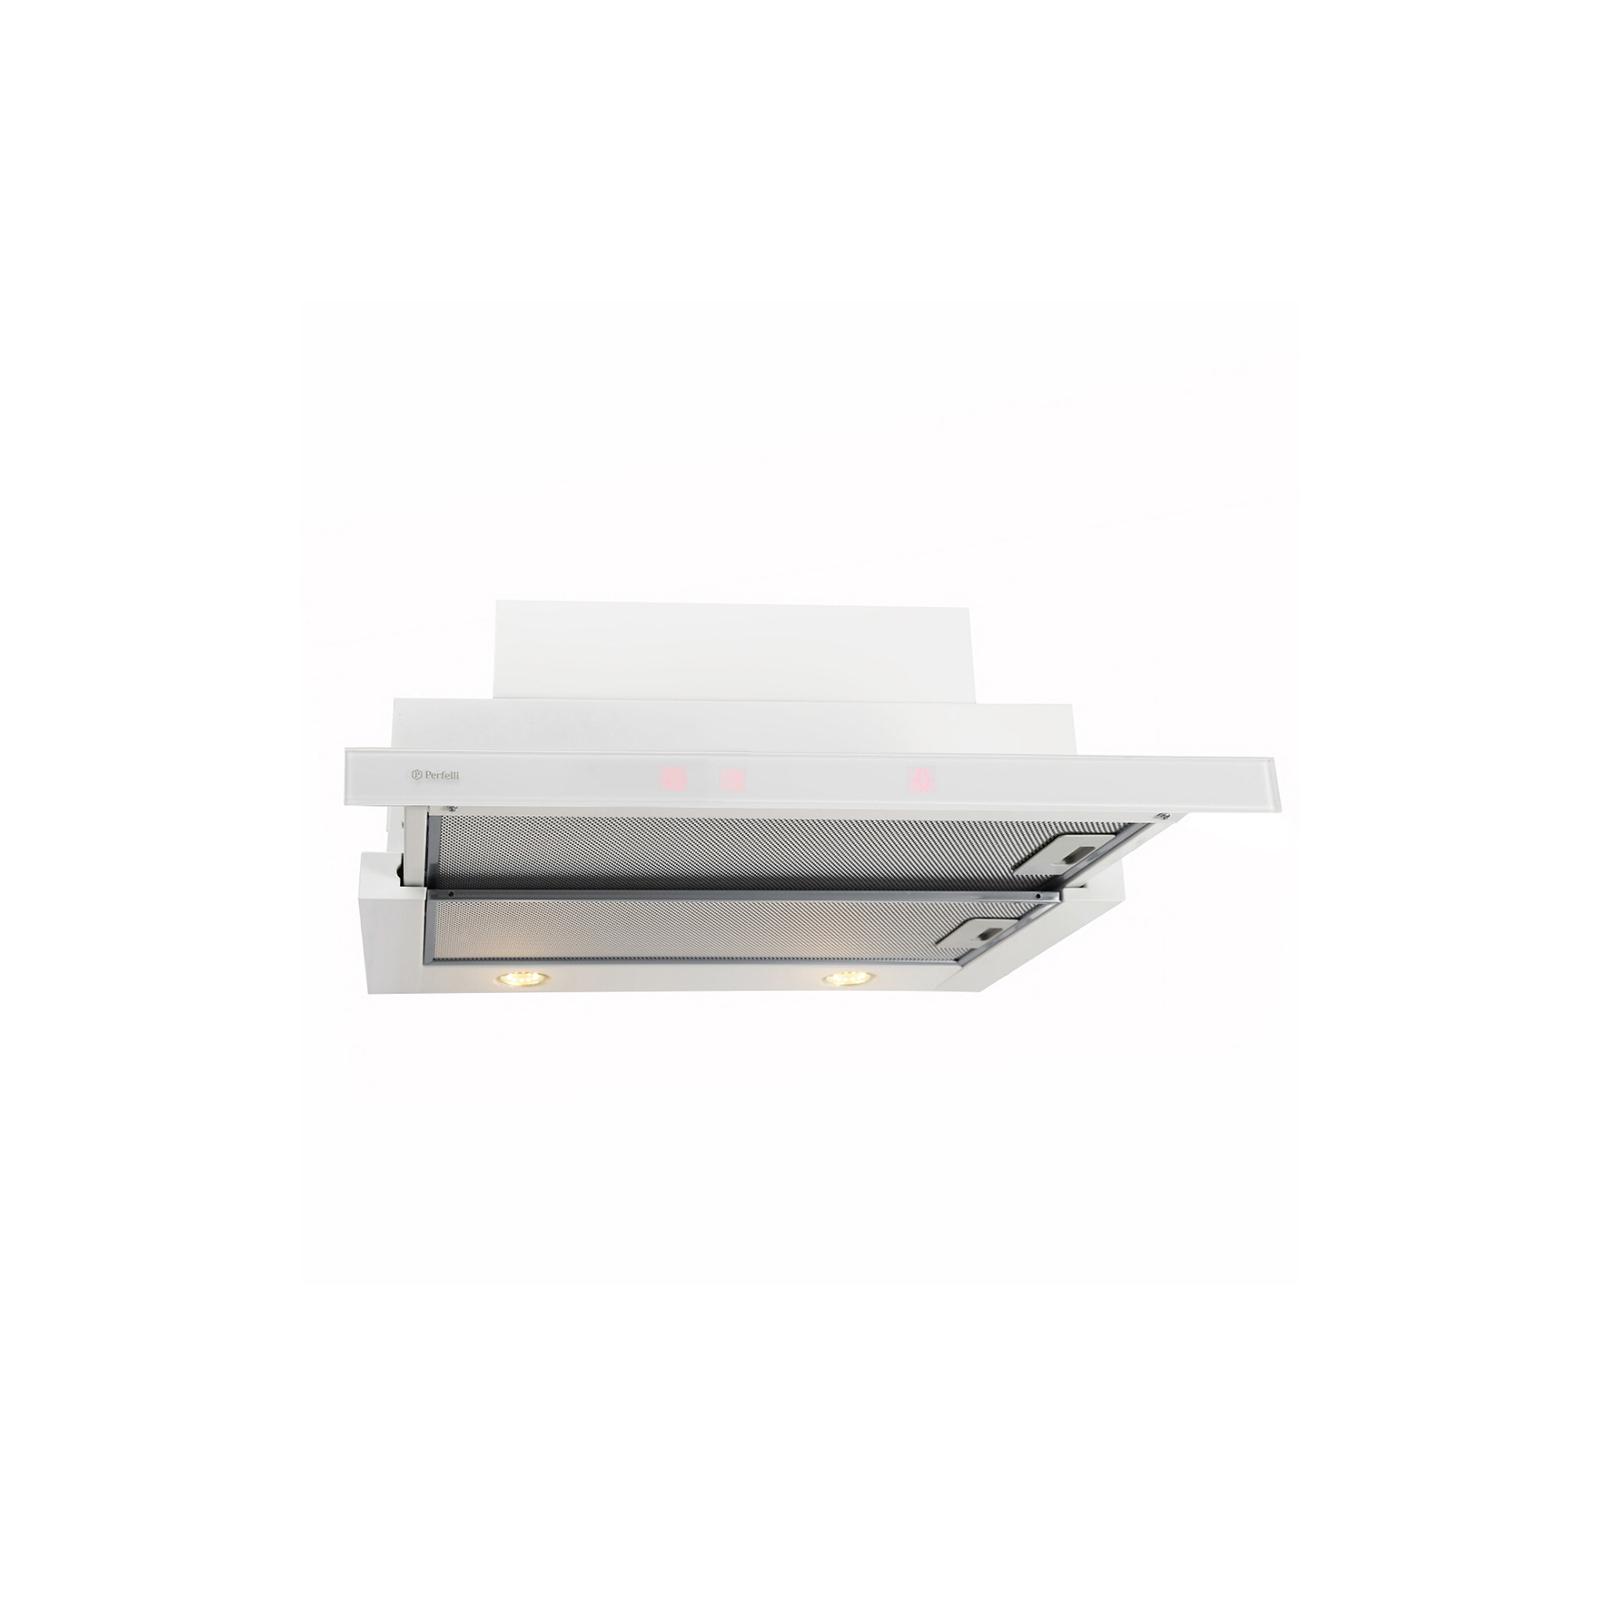 Вытяжка кухонная PERFELLI TLS 6832 W LED изображение 5